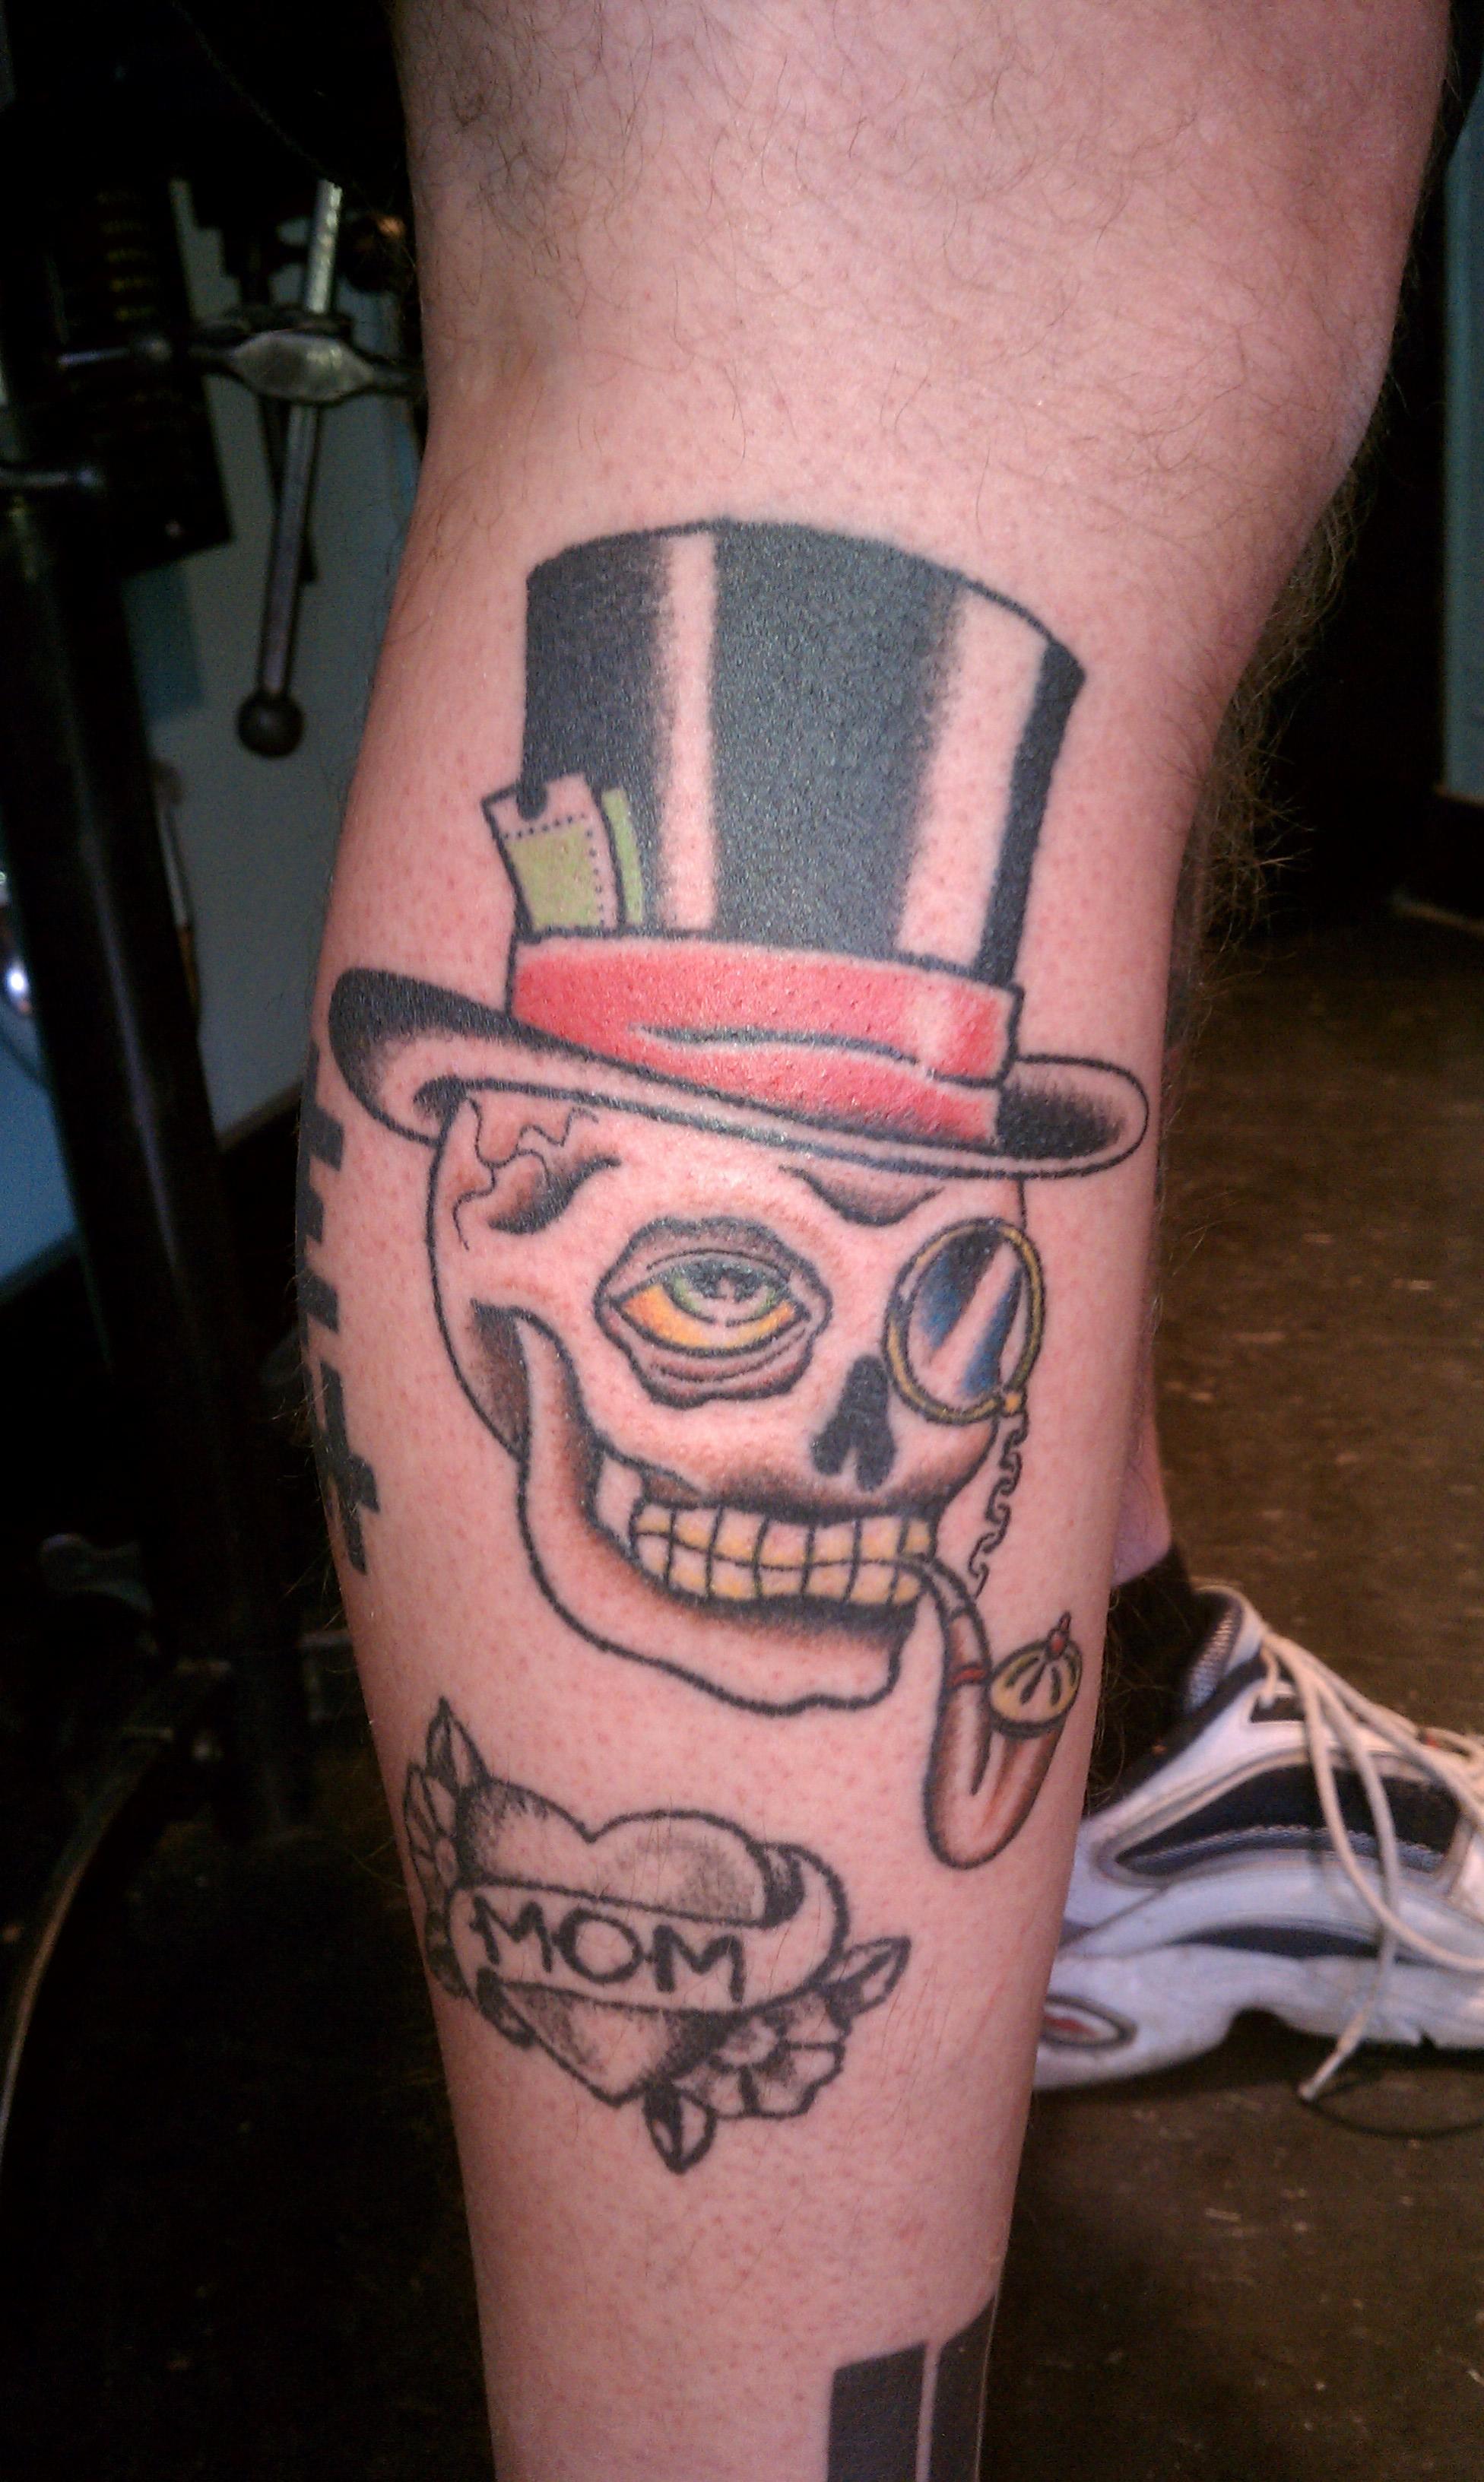 Hand poked skull tattoo by Tracy Zumwalt